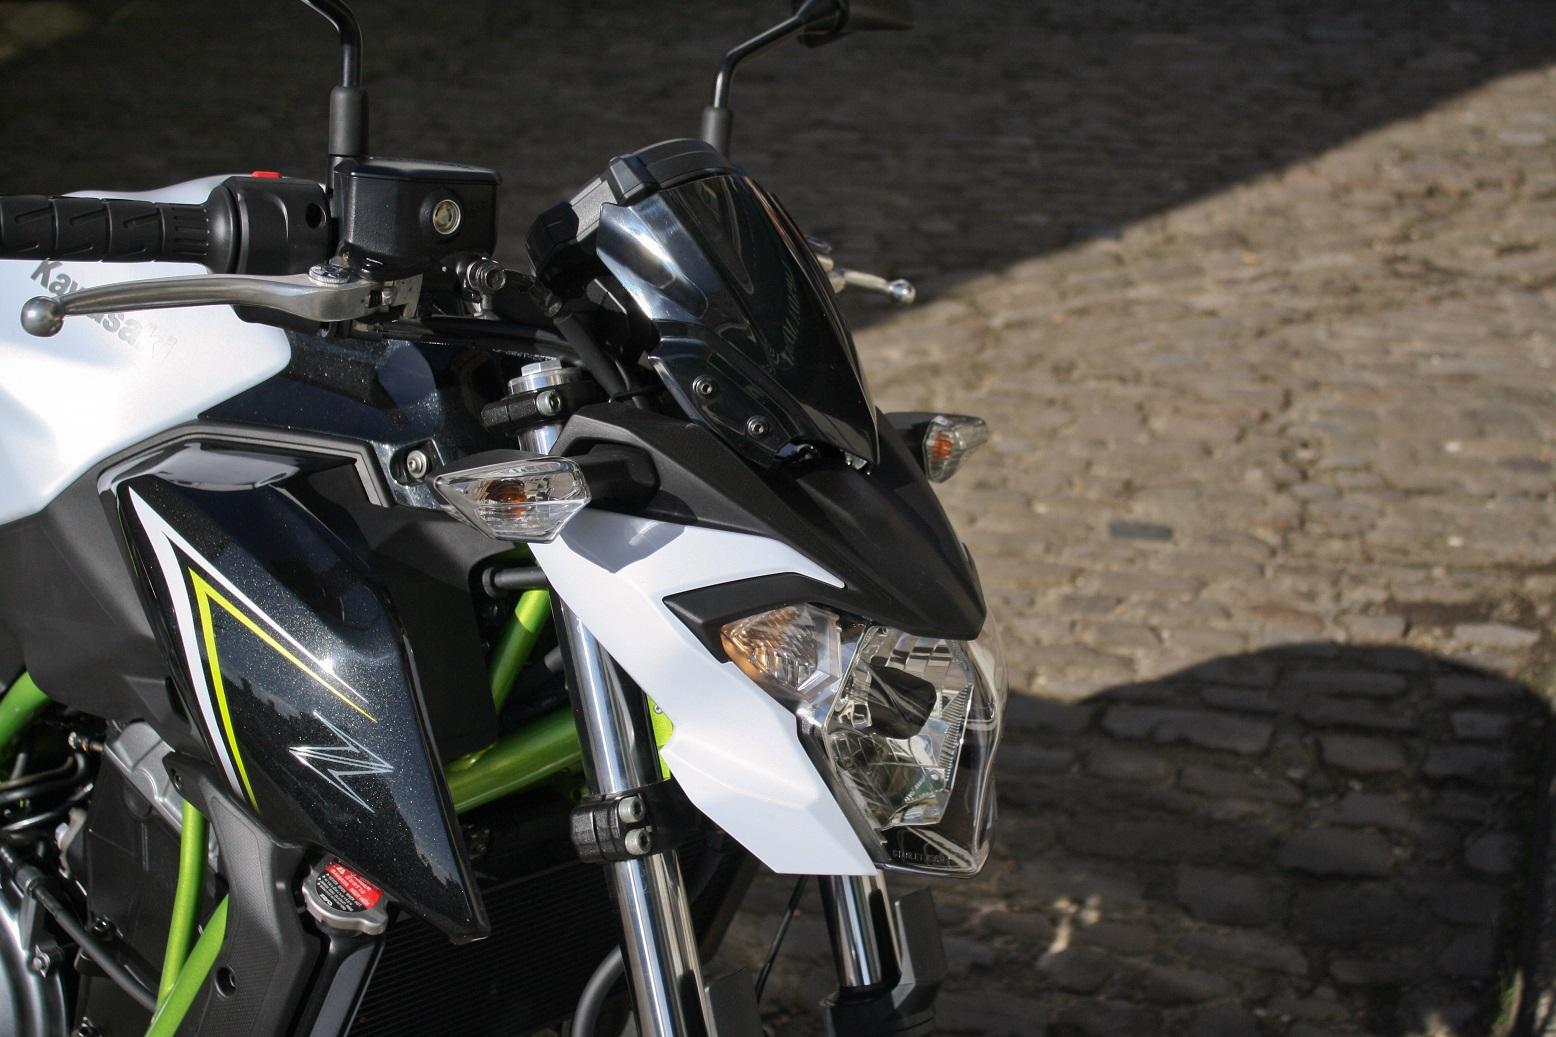 Kawasaki Z650 front light